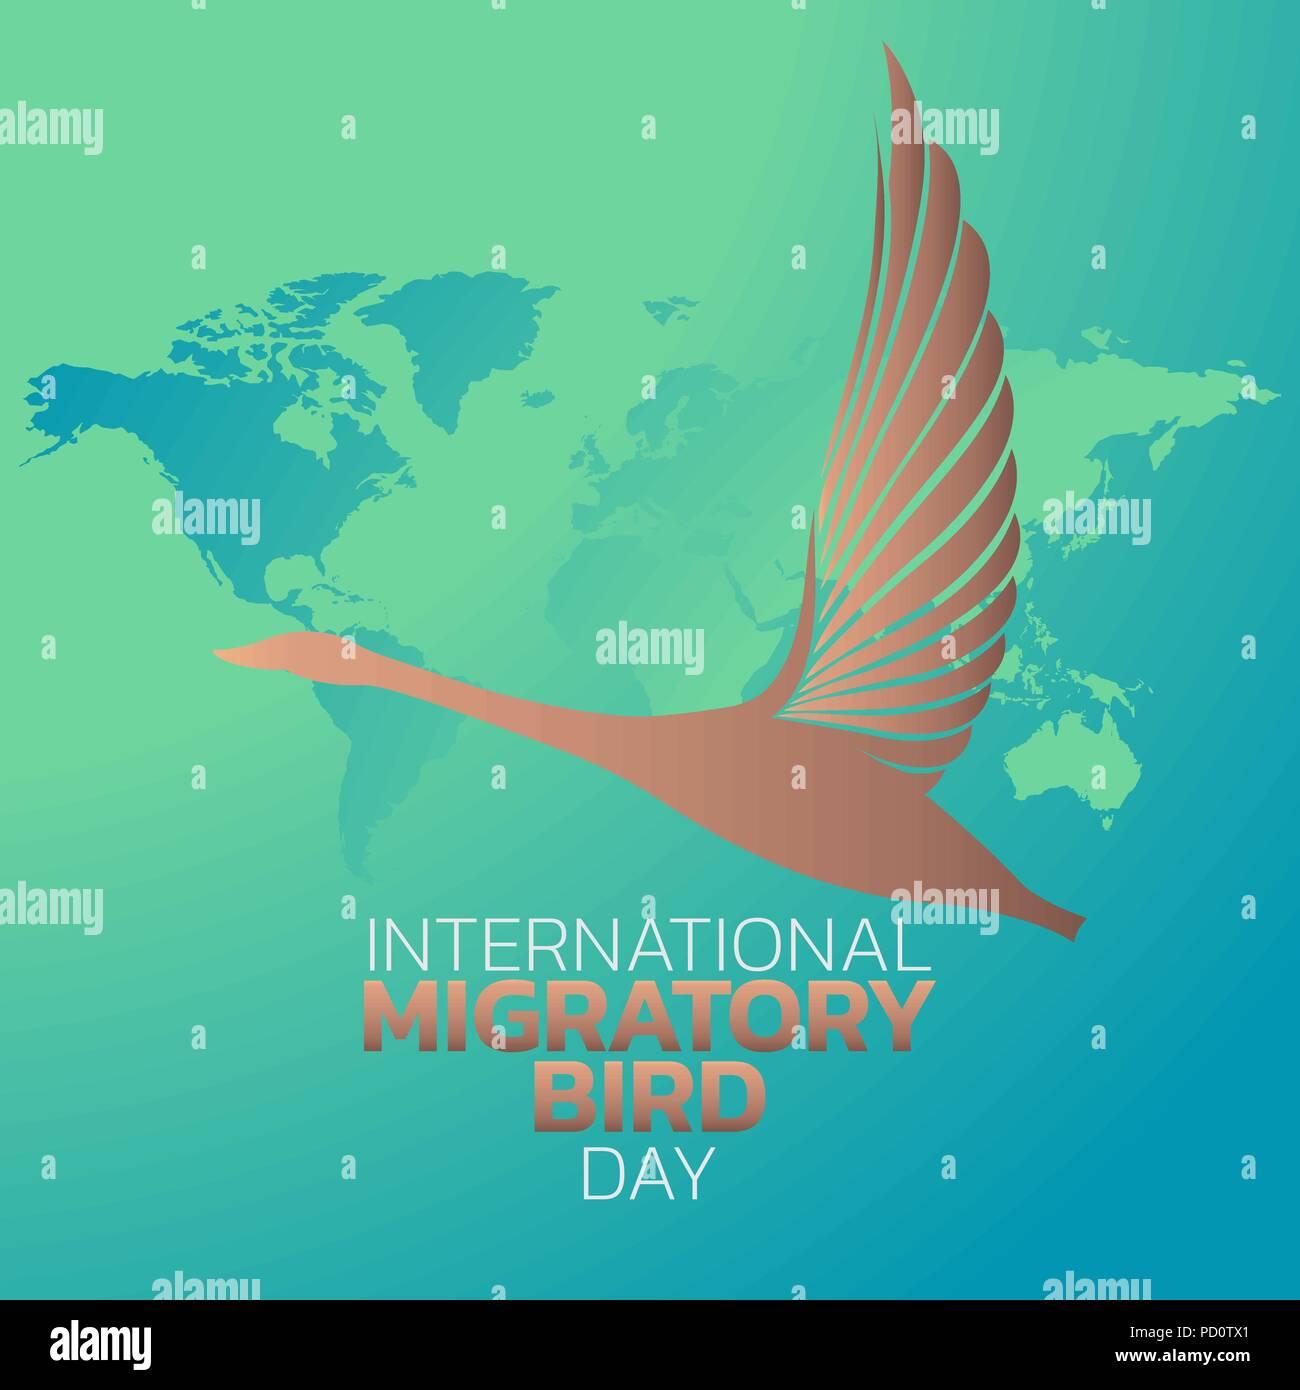 International Migratory Bird Day logo icon design, vector illustration - Stock Vector